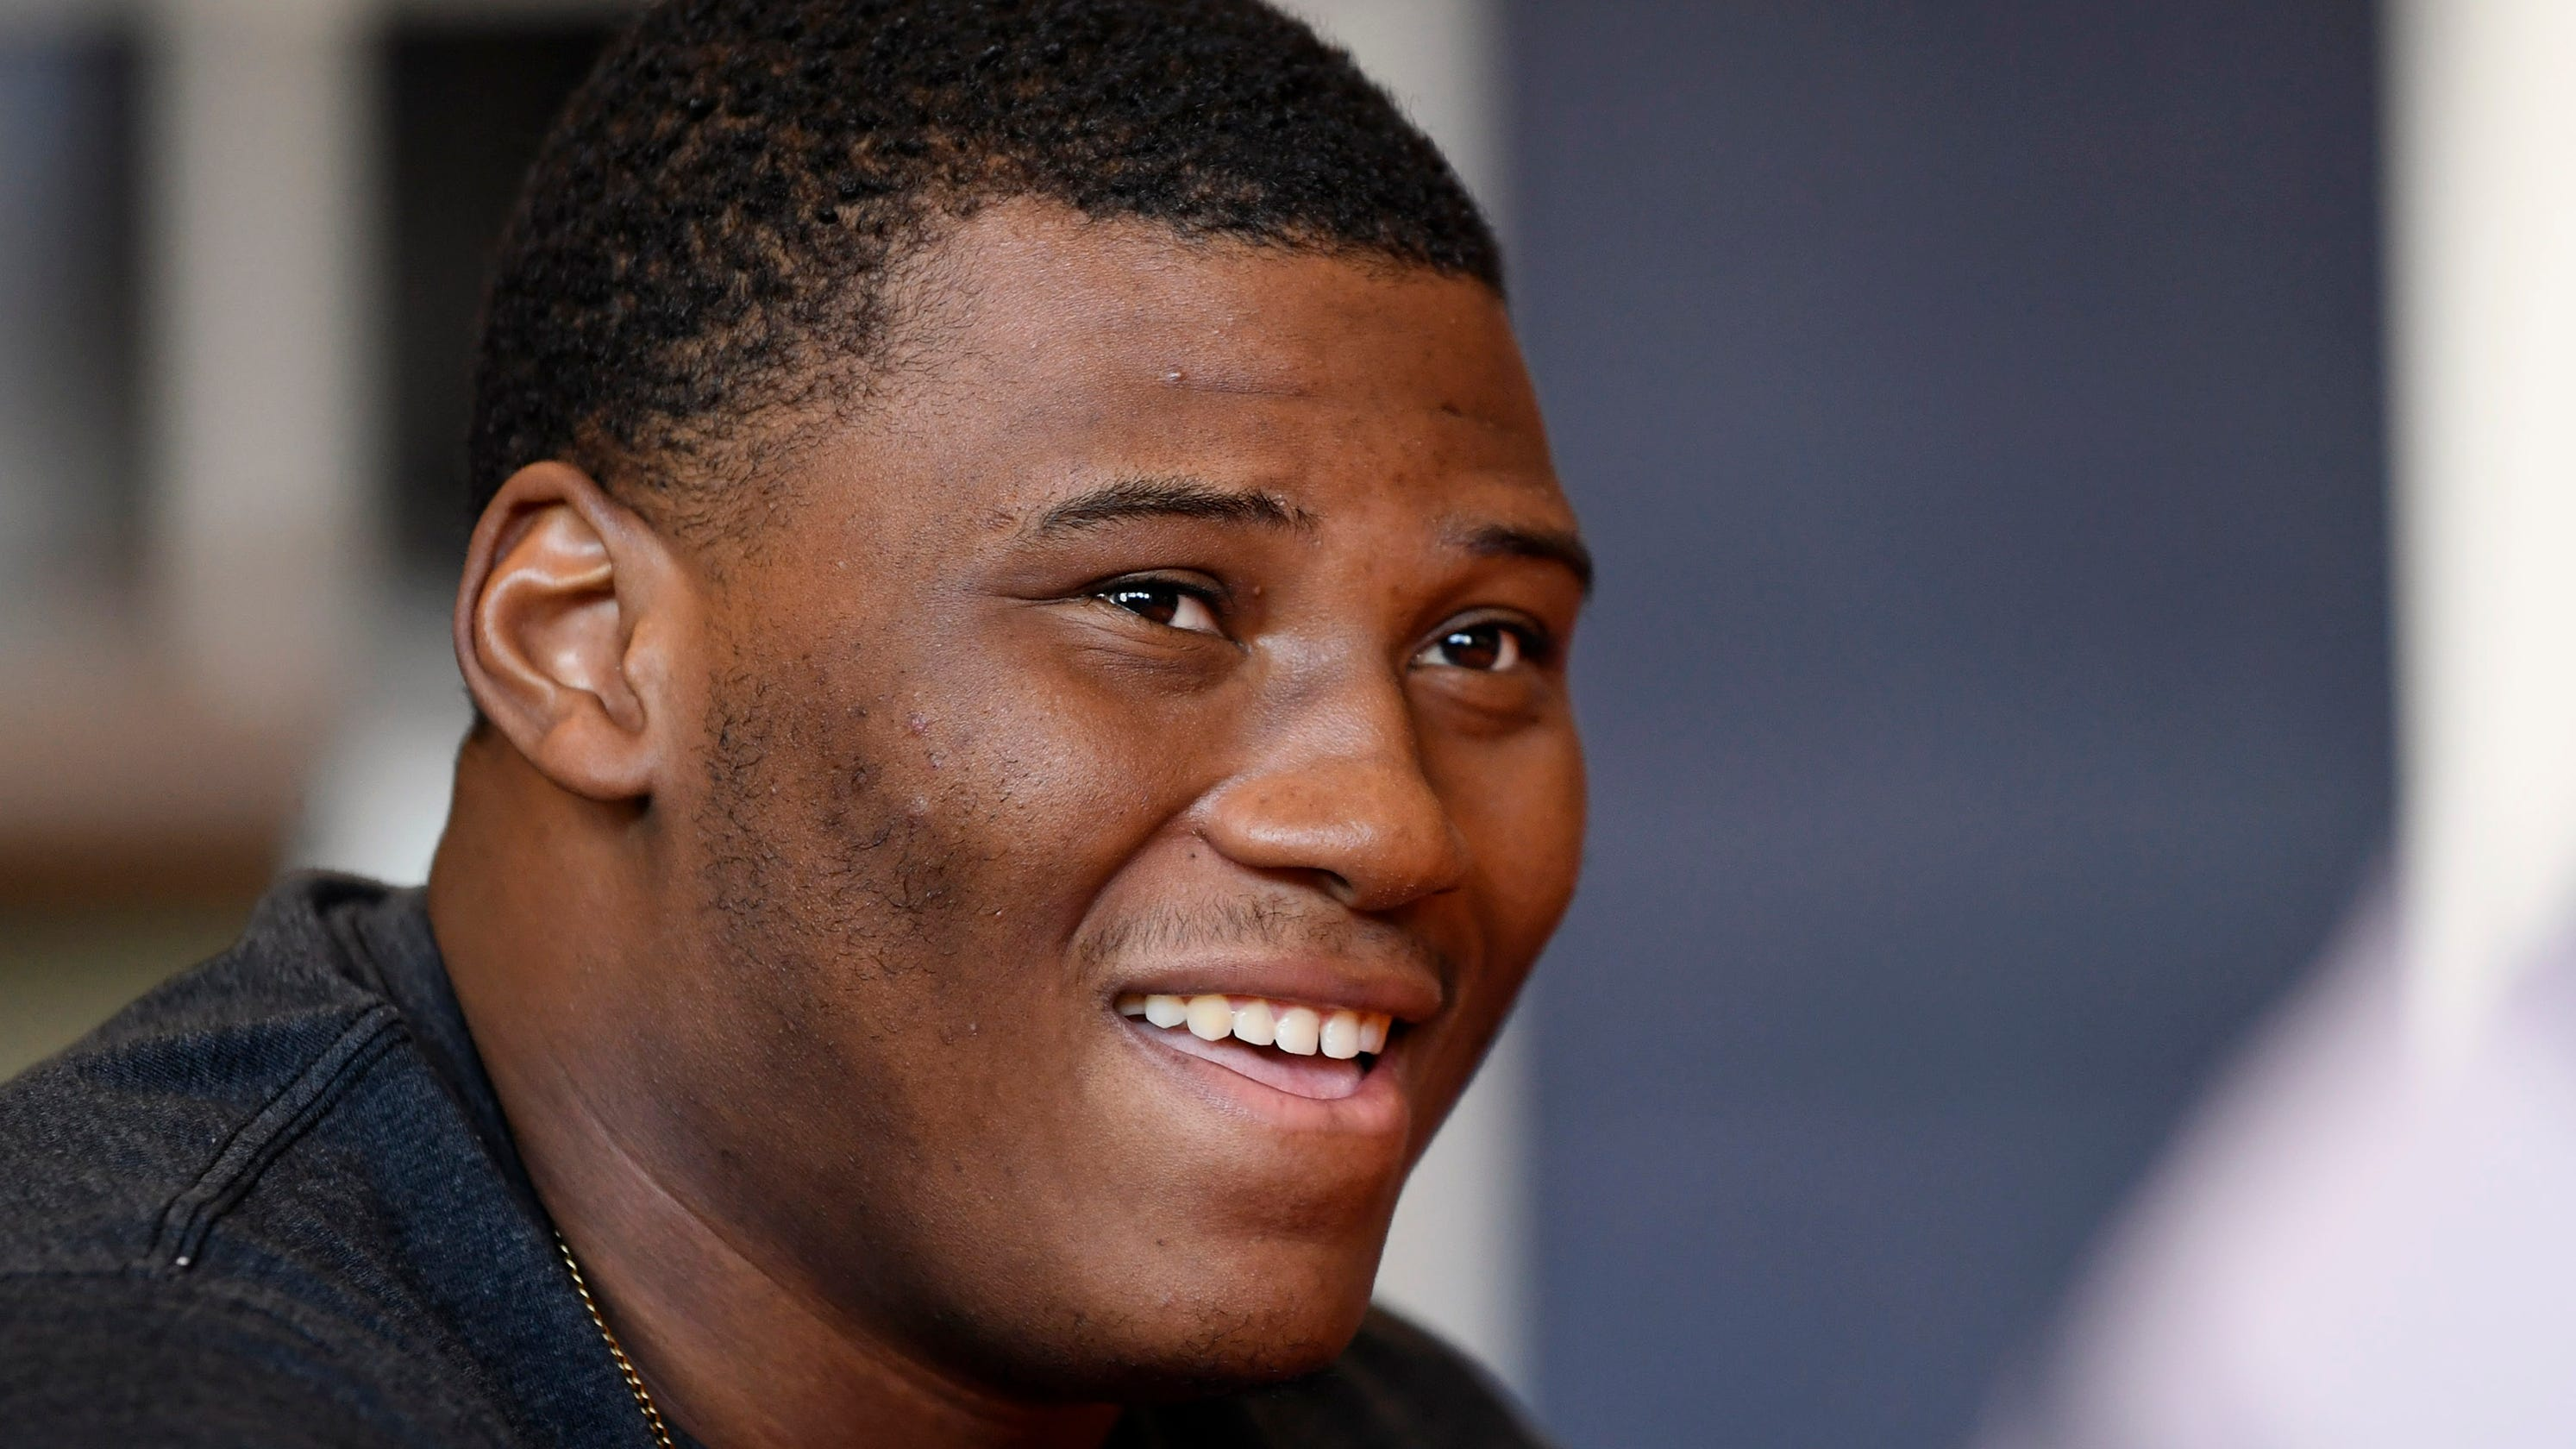 Senior defensive tackle Derrick Brown has charted his own path at Auburn